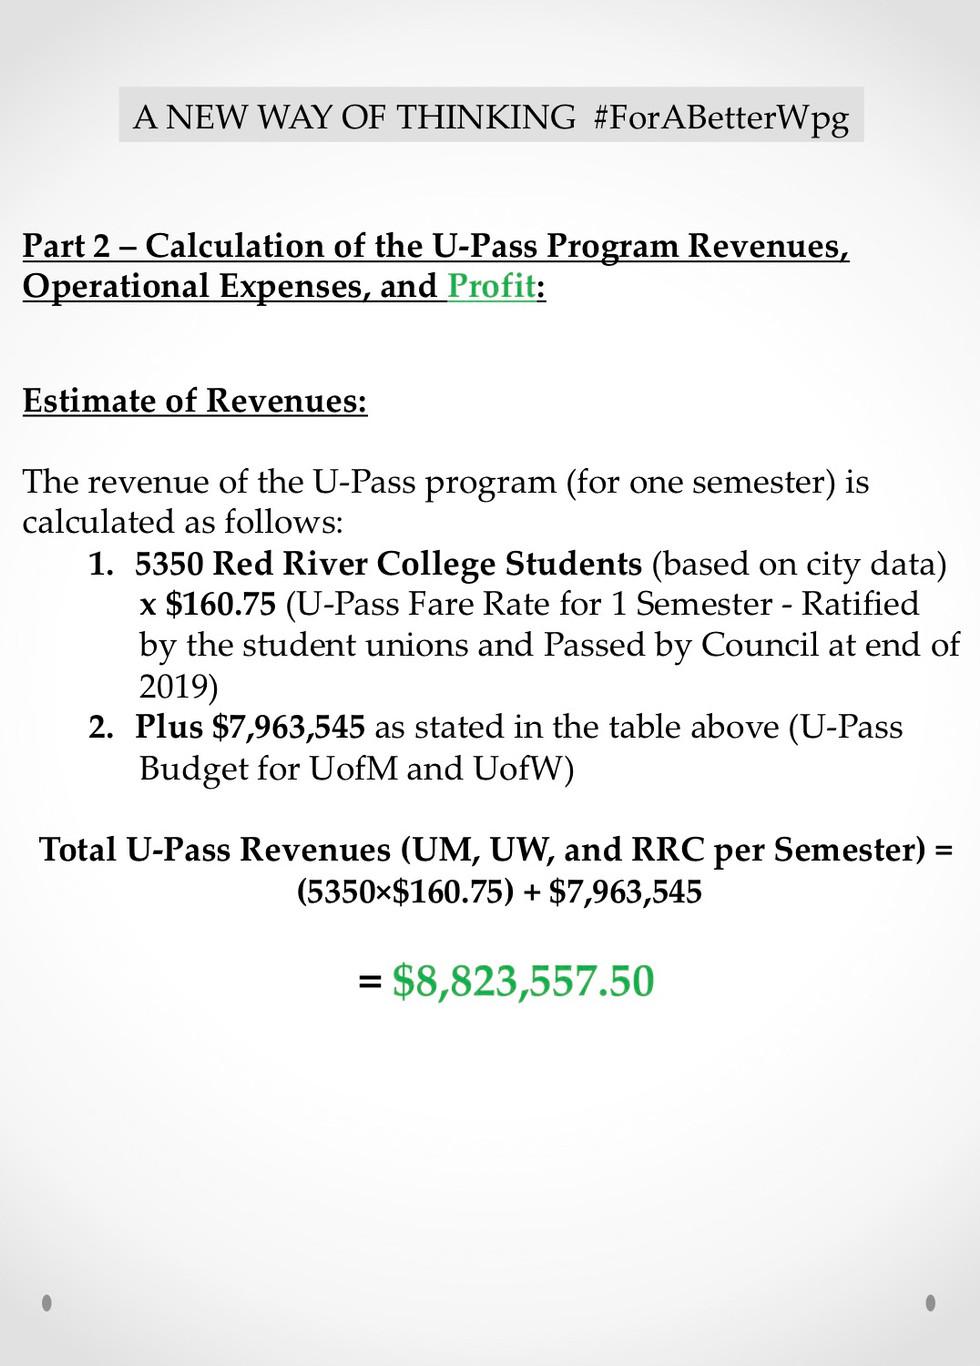 U-Pass Findings & Alternative 11.jpg